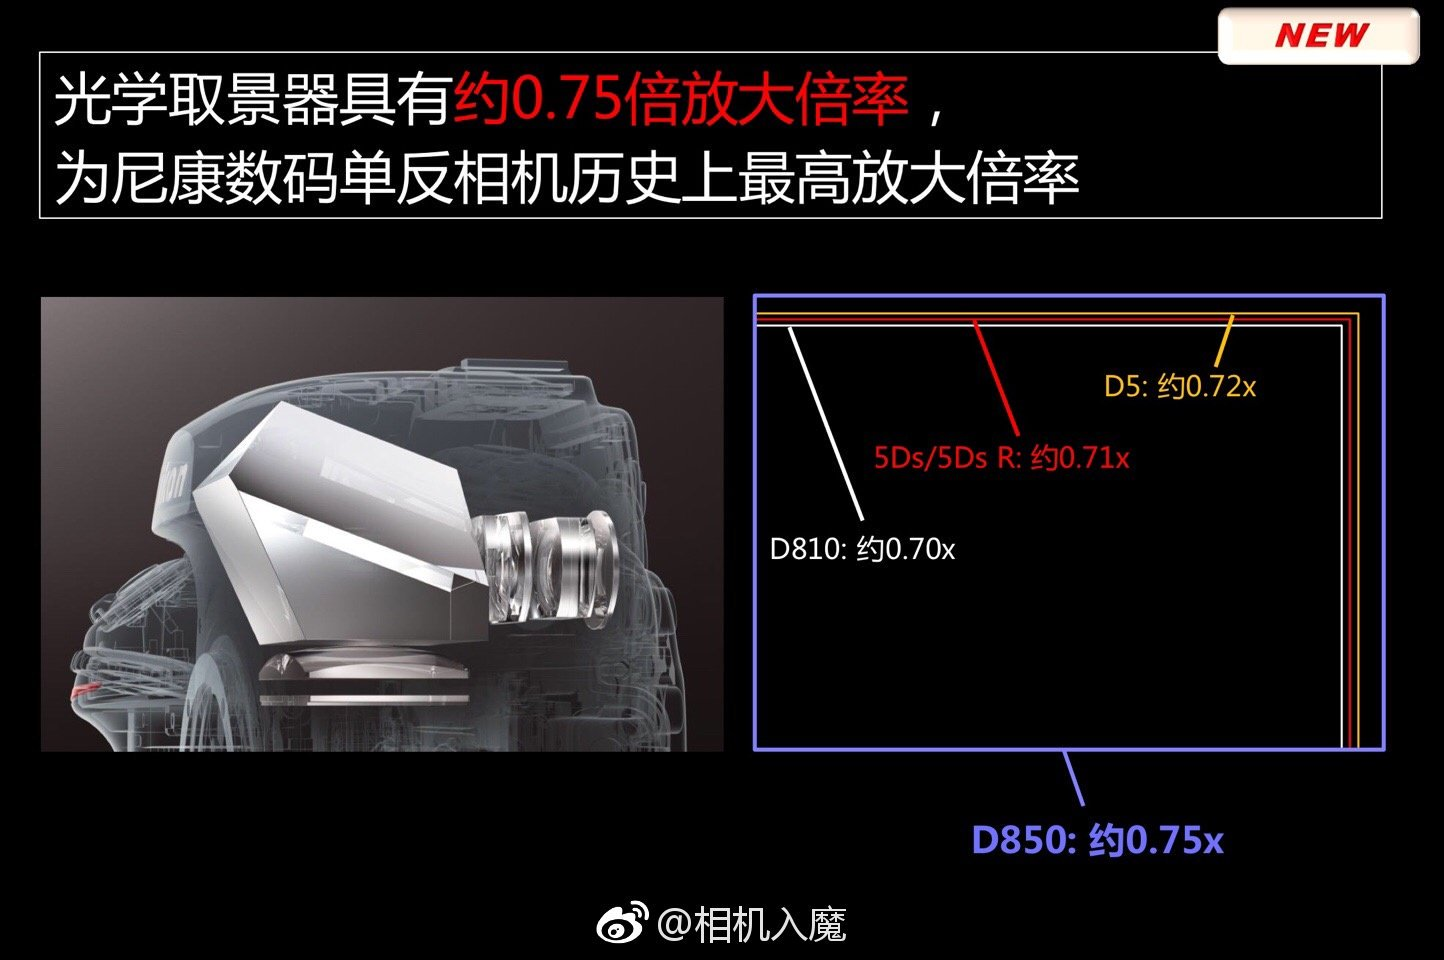 Nikon-D850-camera-presentation-leaked-18